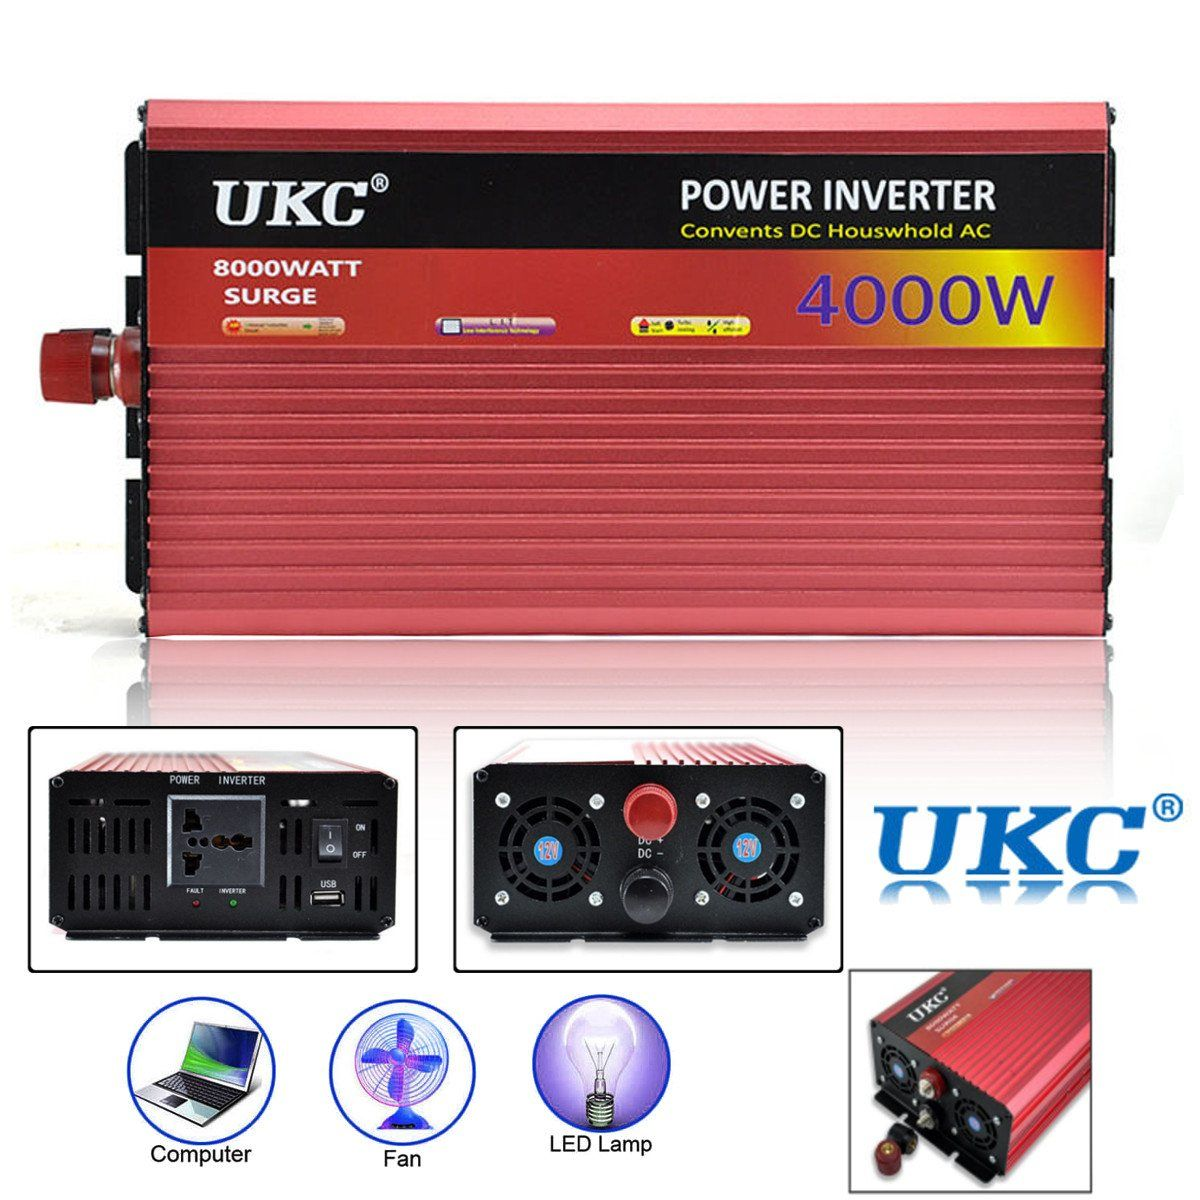 Power Inverter 12V 220V 4000W 8000W Peak- Modified Sine Wave Power Inverter DC12V to AC220V Voltage Transformer Converter USB